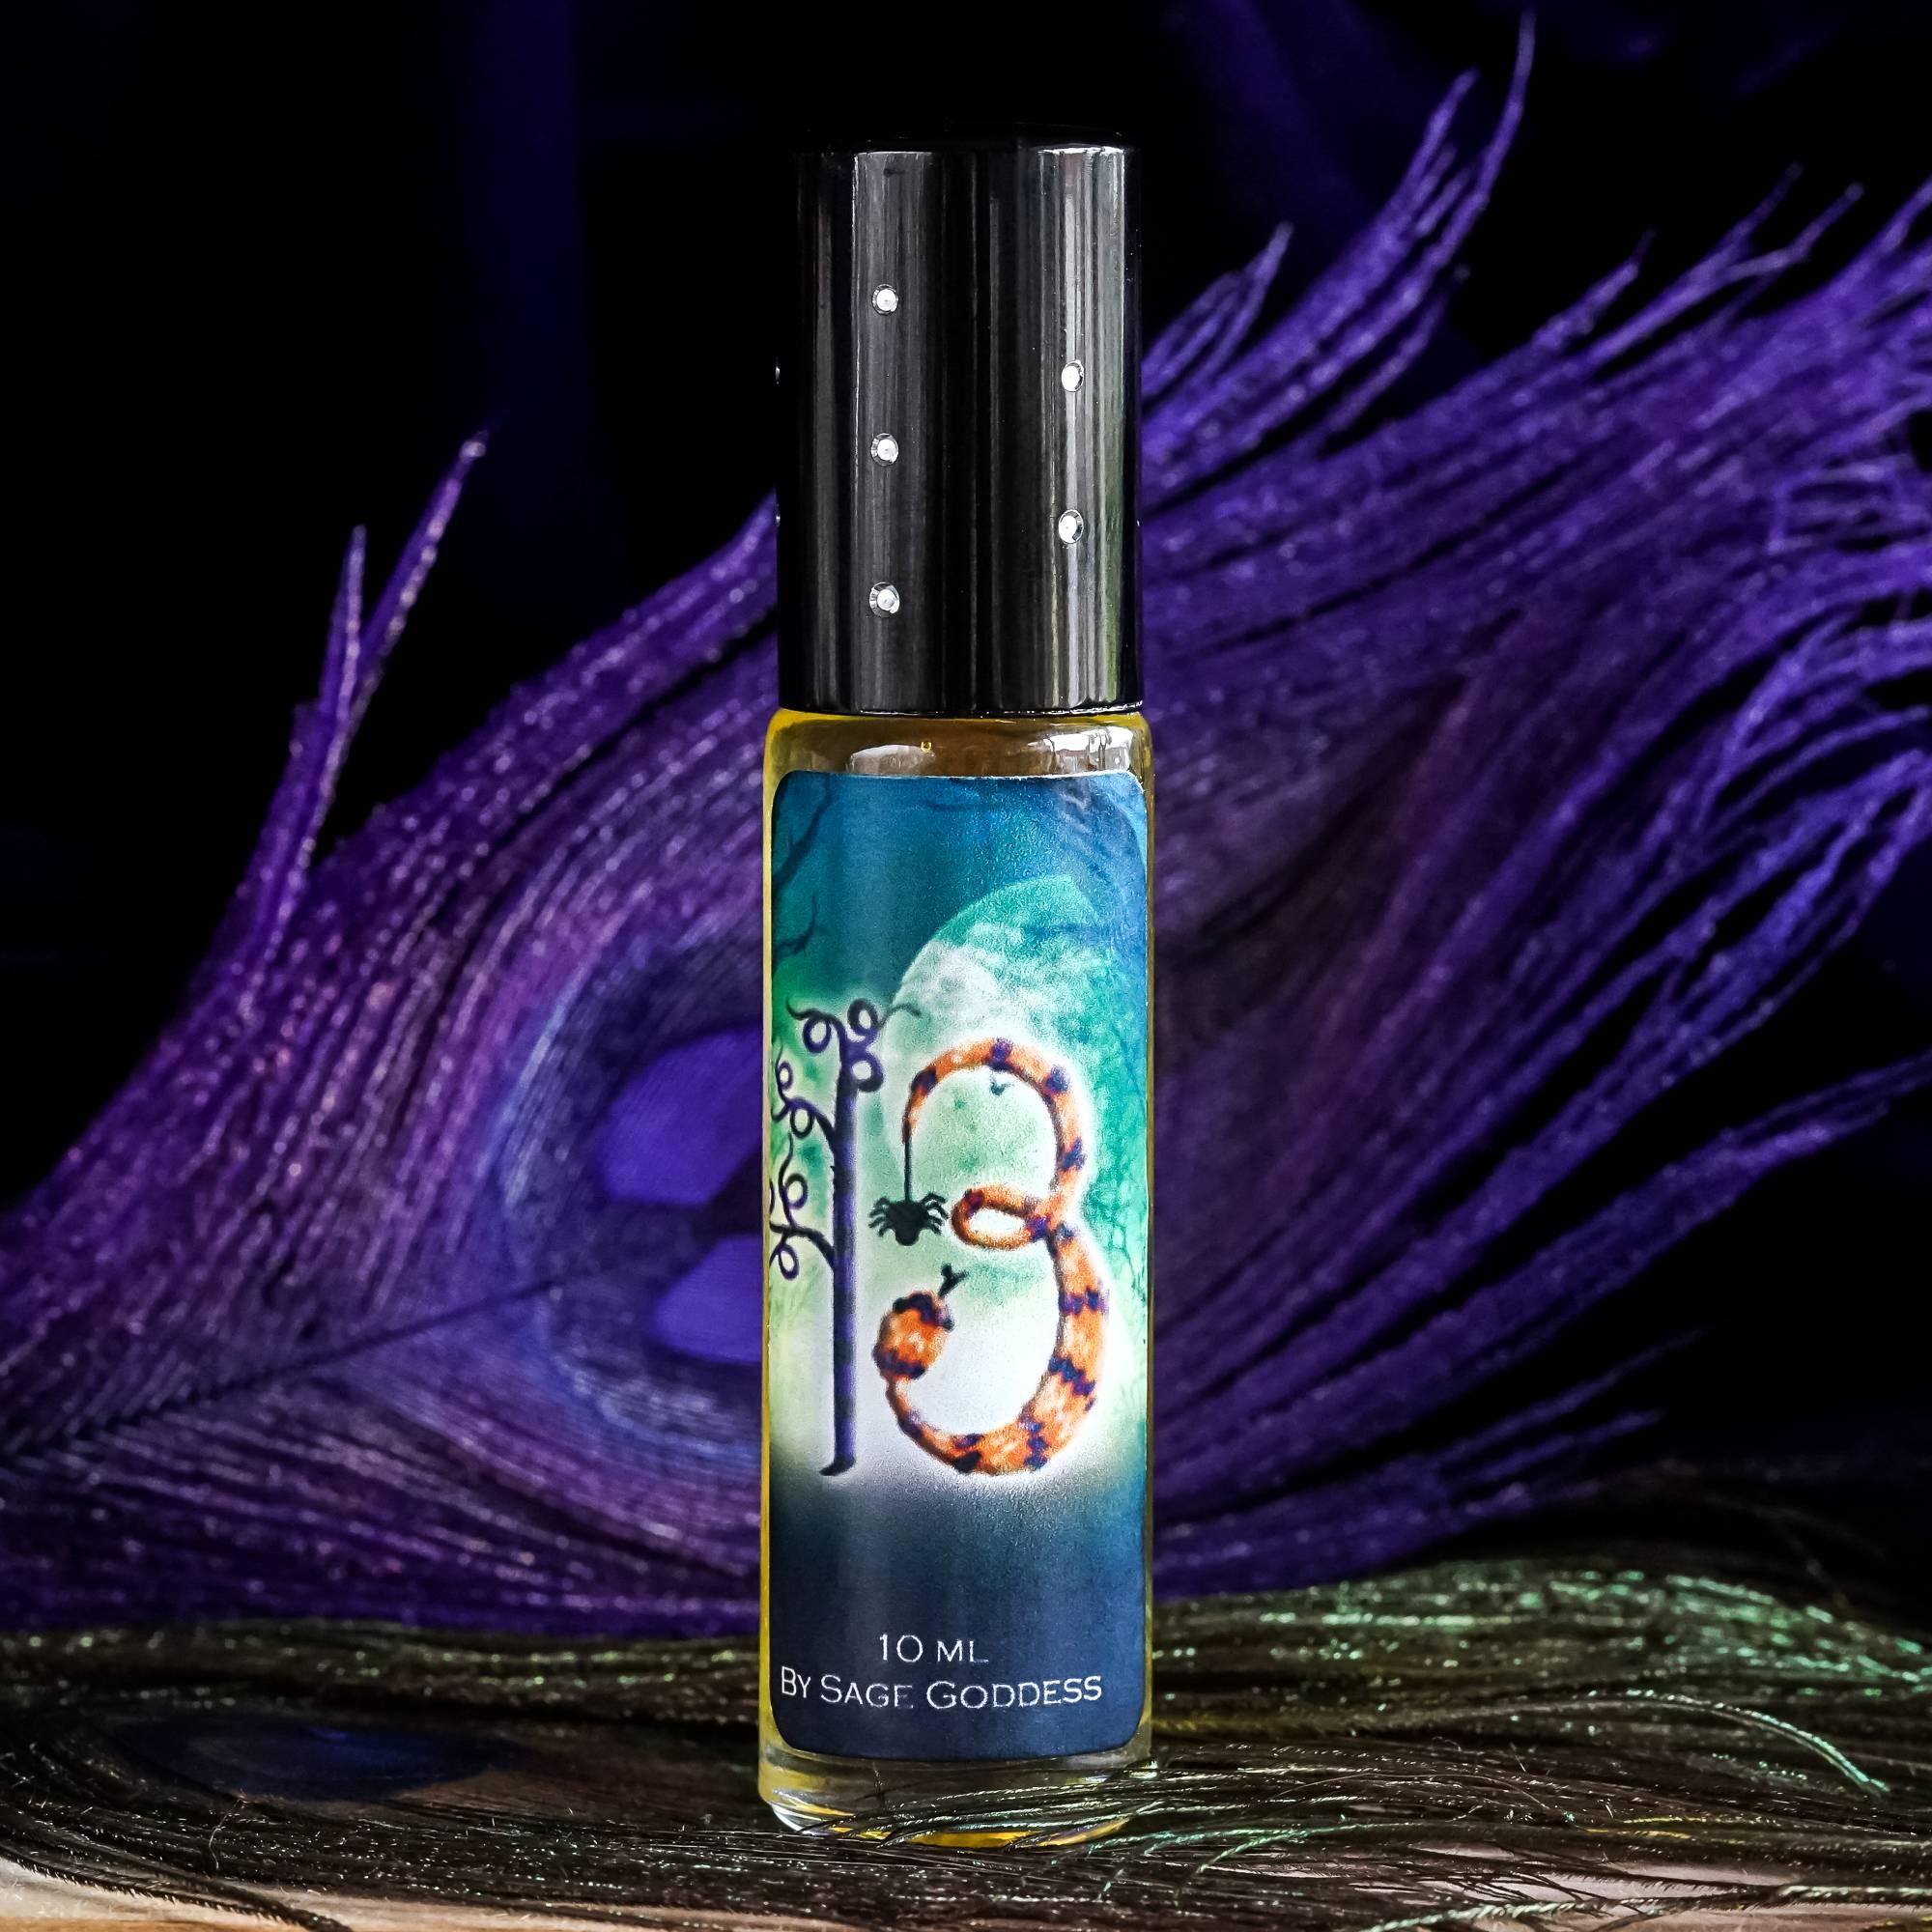 13 perfume